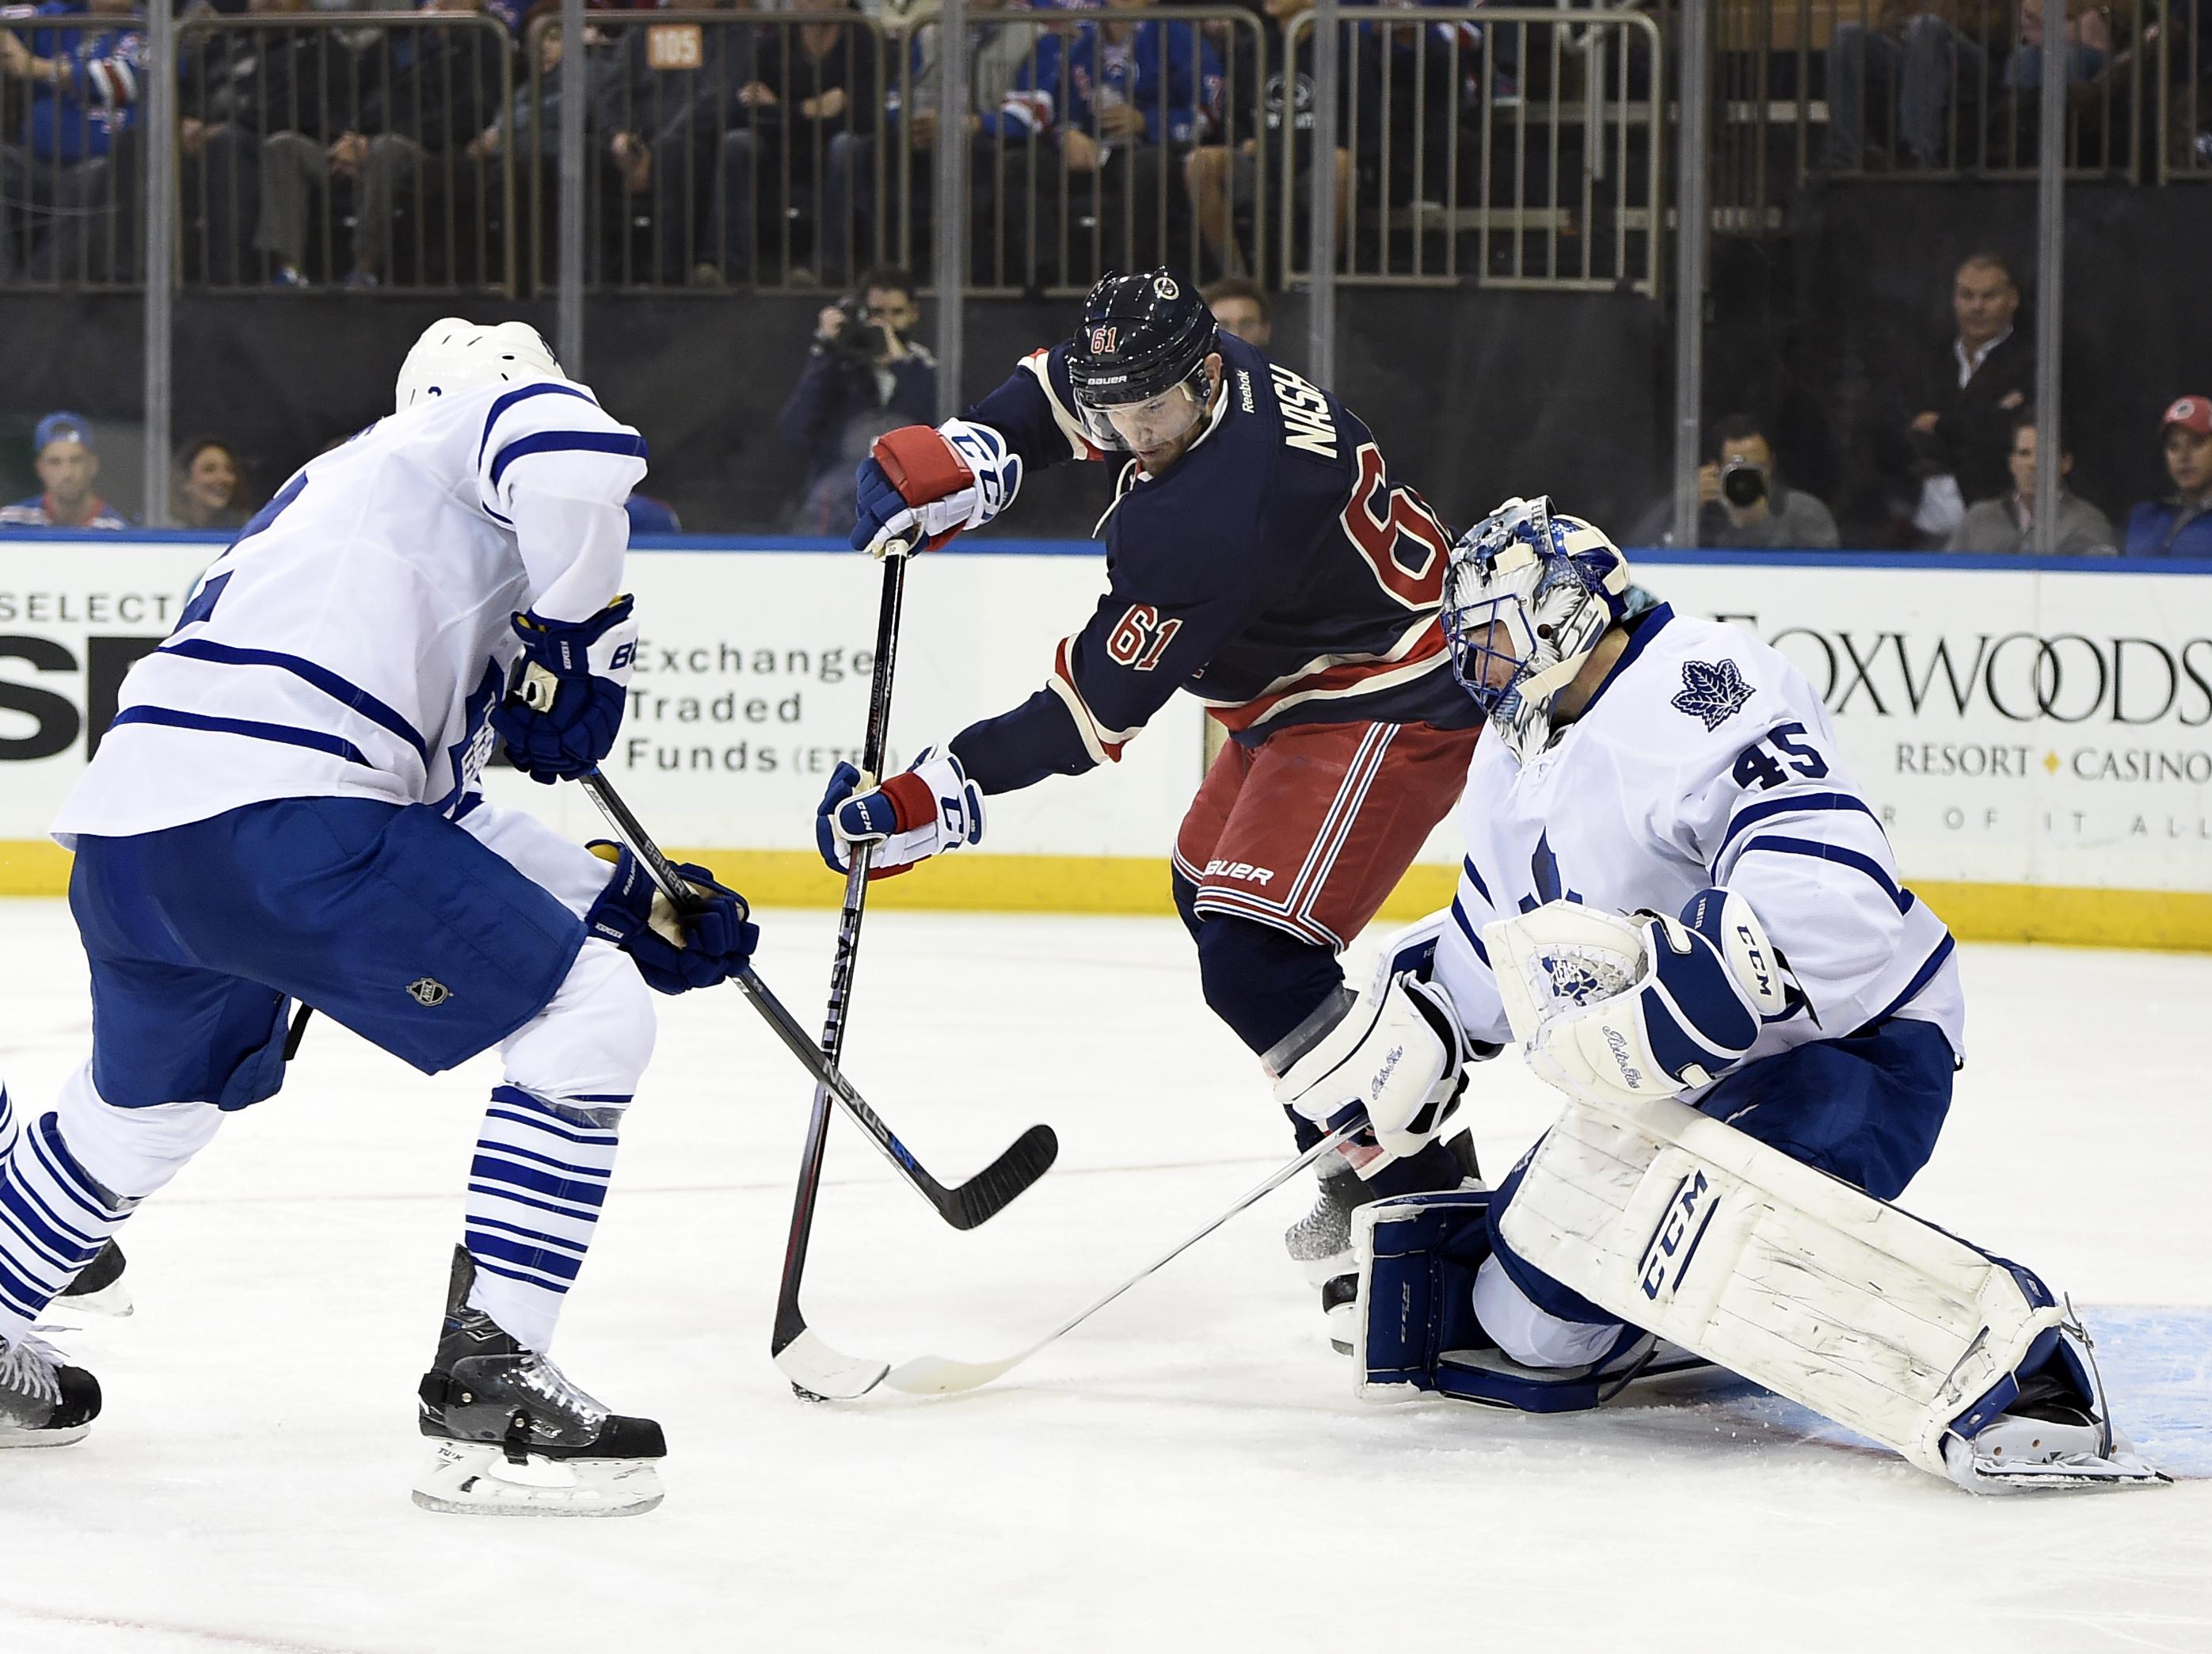 Toronto Maple Leafs defenseman Matt Hunwick (2) and goalie Jonathan Bernier (45) defend the net against New York Rangers left wing Rick Nash (61) during the second period of an NHL hockey game on Friday, Oct. 30, 2015, in New York. (AP Photo/Kathy Kmonice